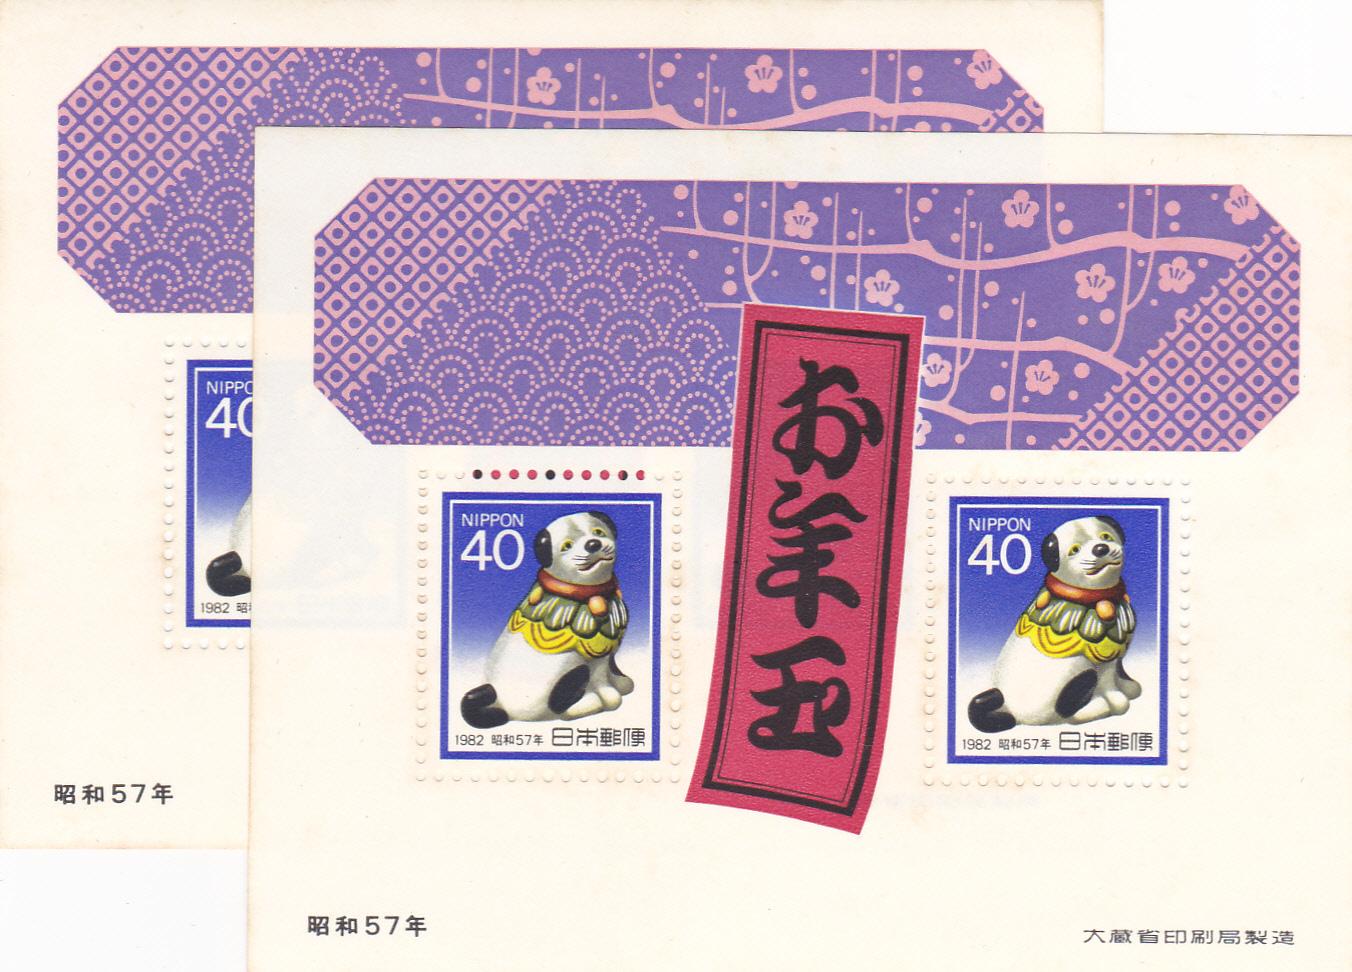 1982IMG_0002.jpg